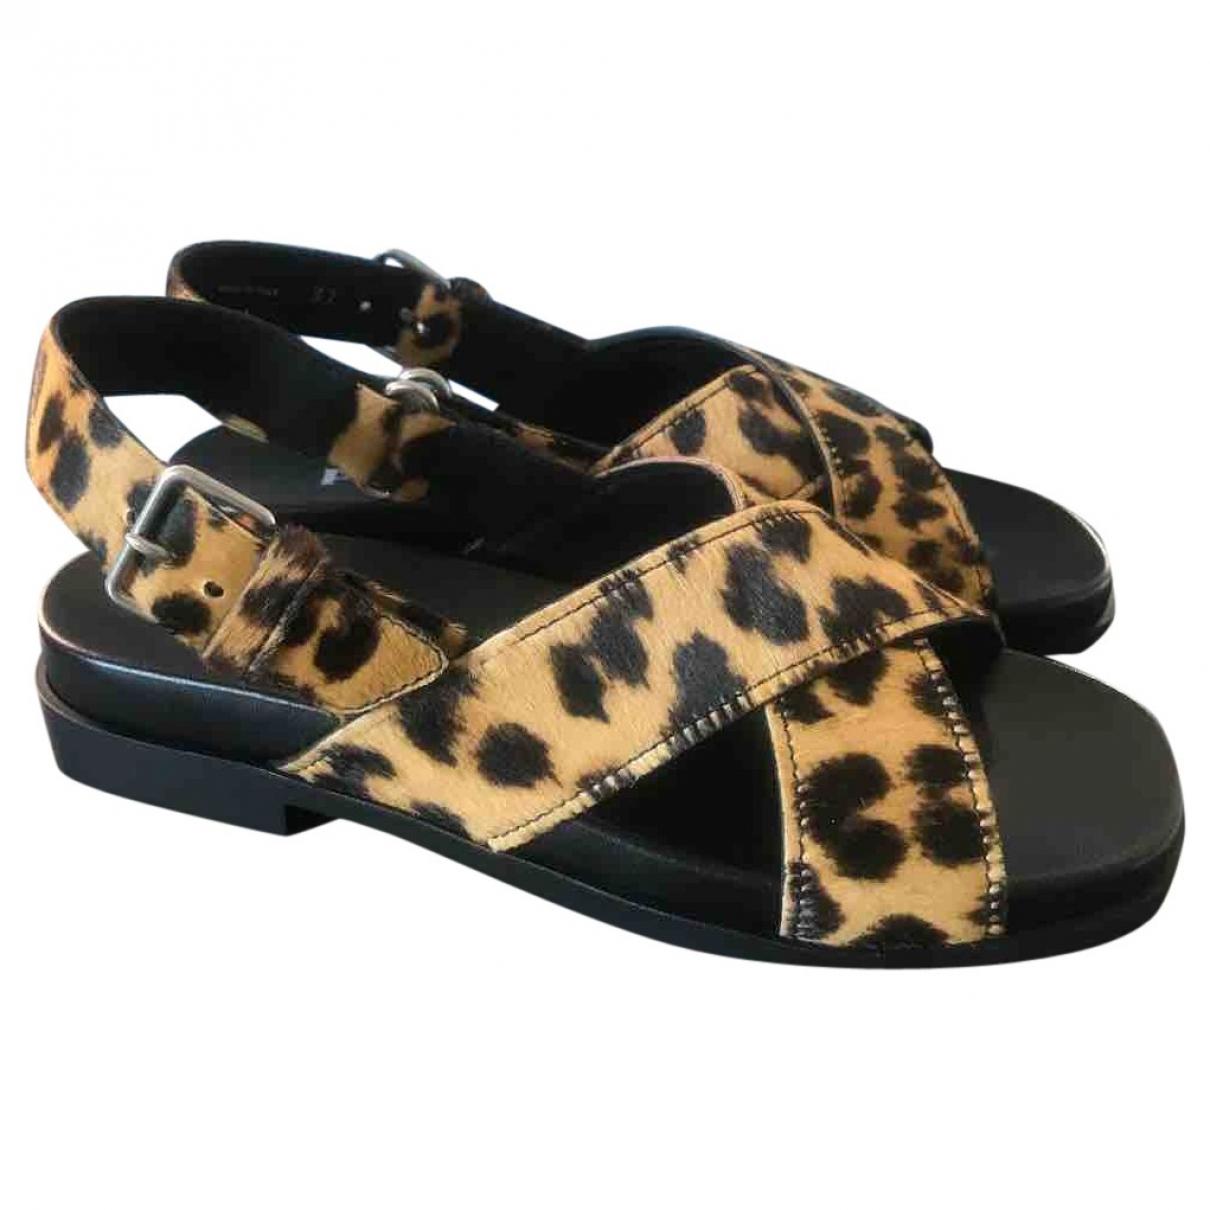 Prada \N Beige Pony-style calfskin Sandals for Women 37 IT